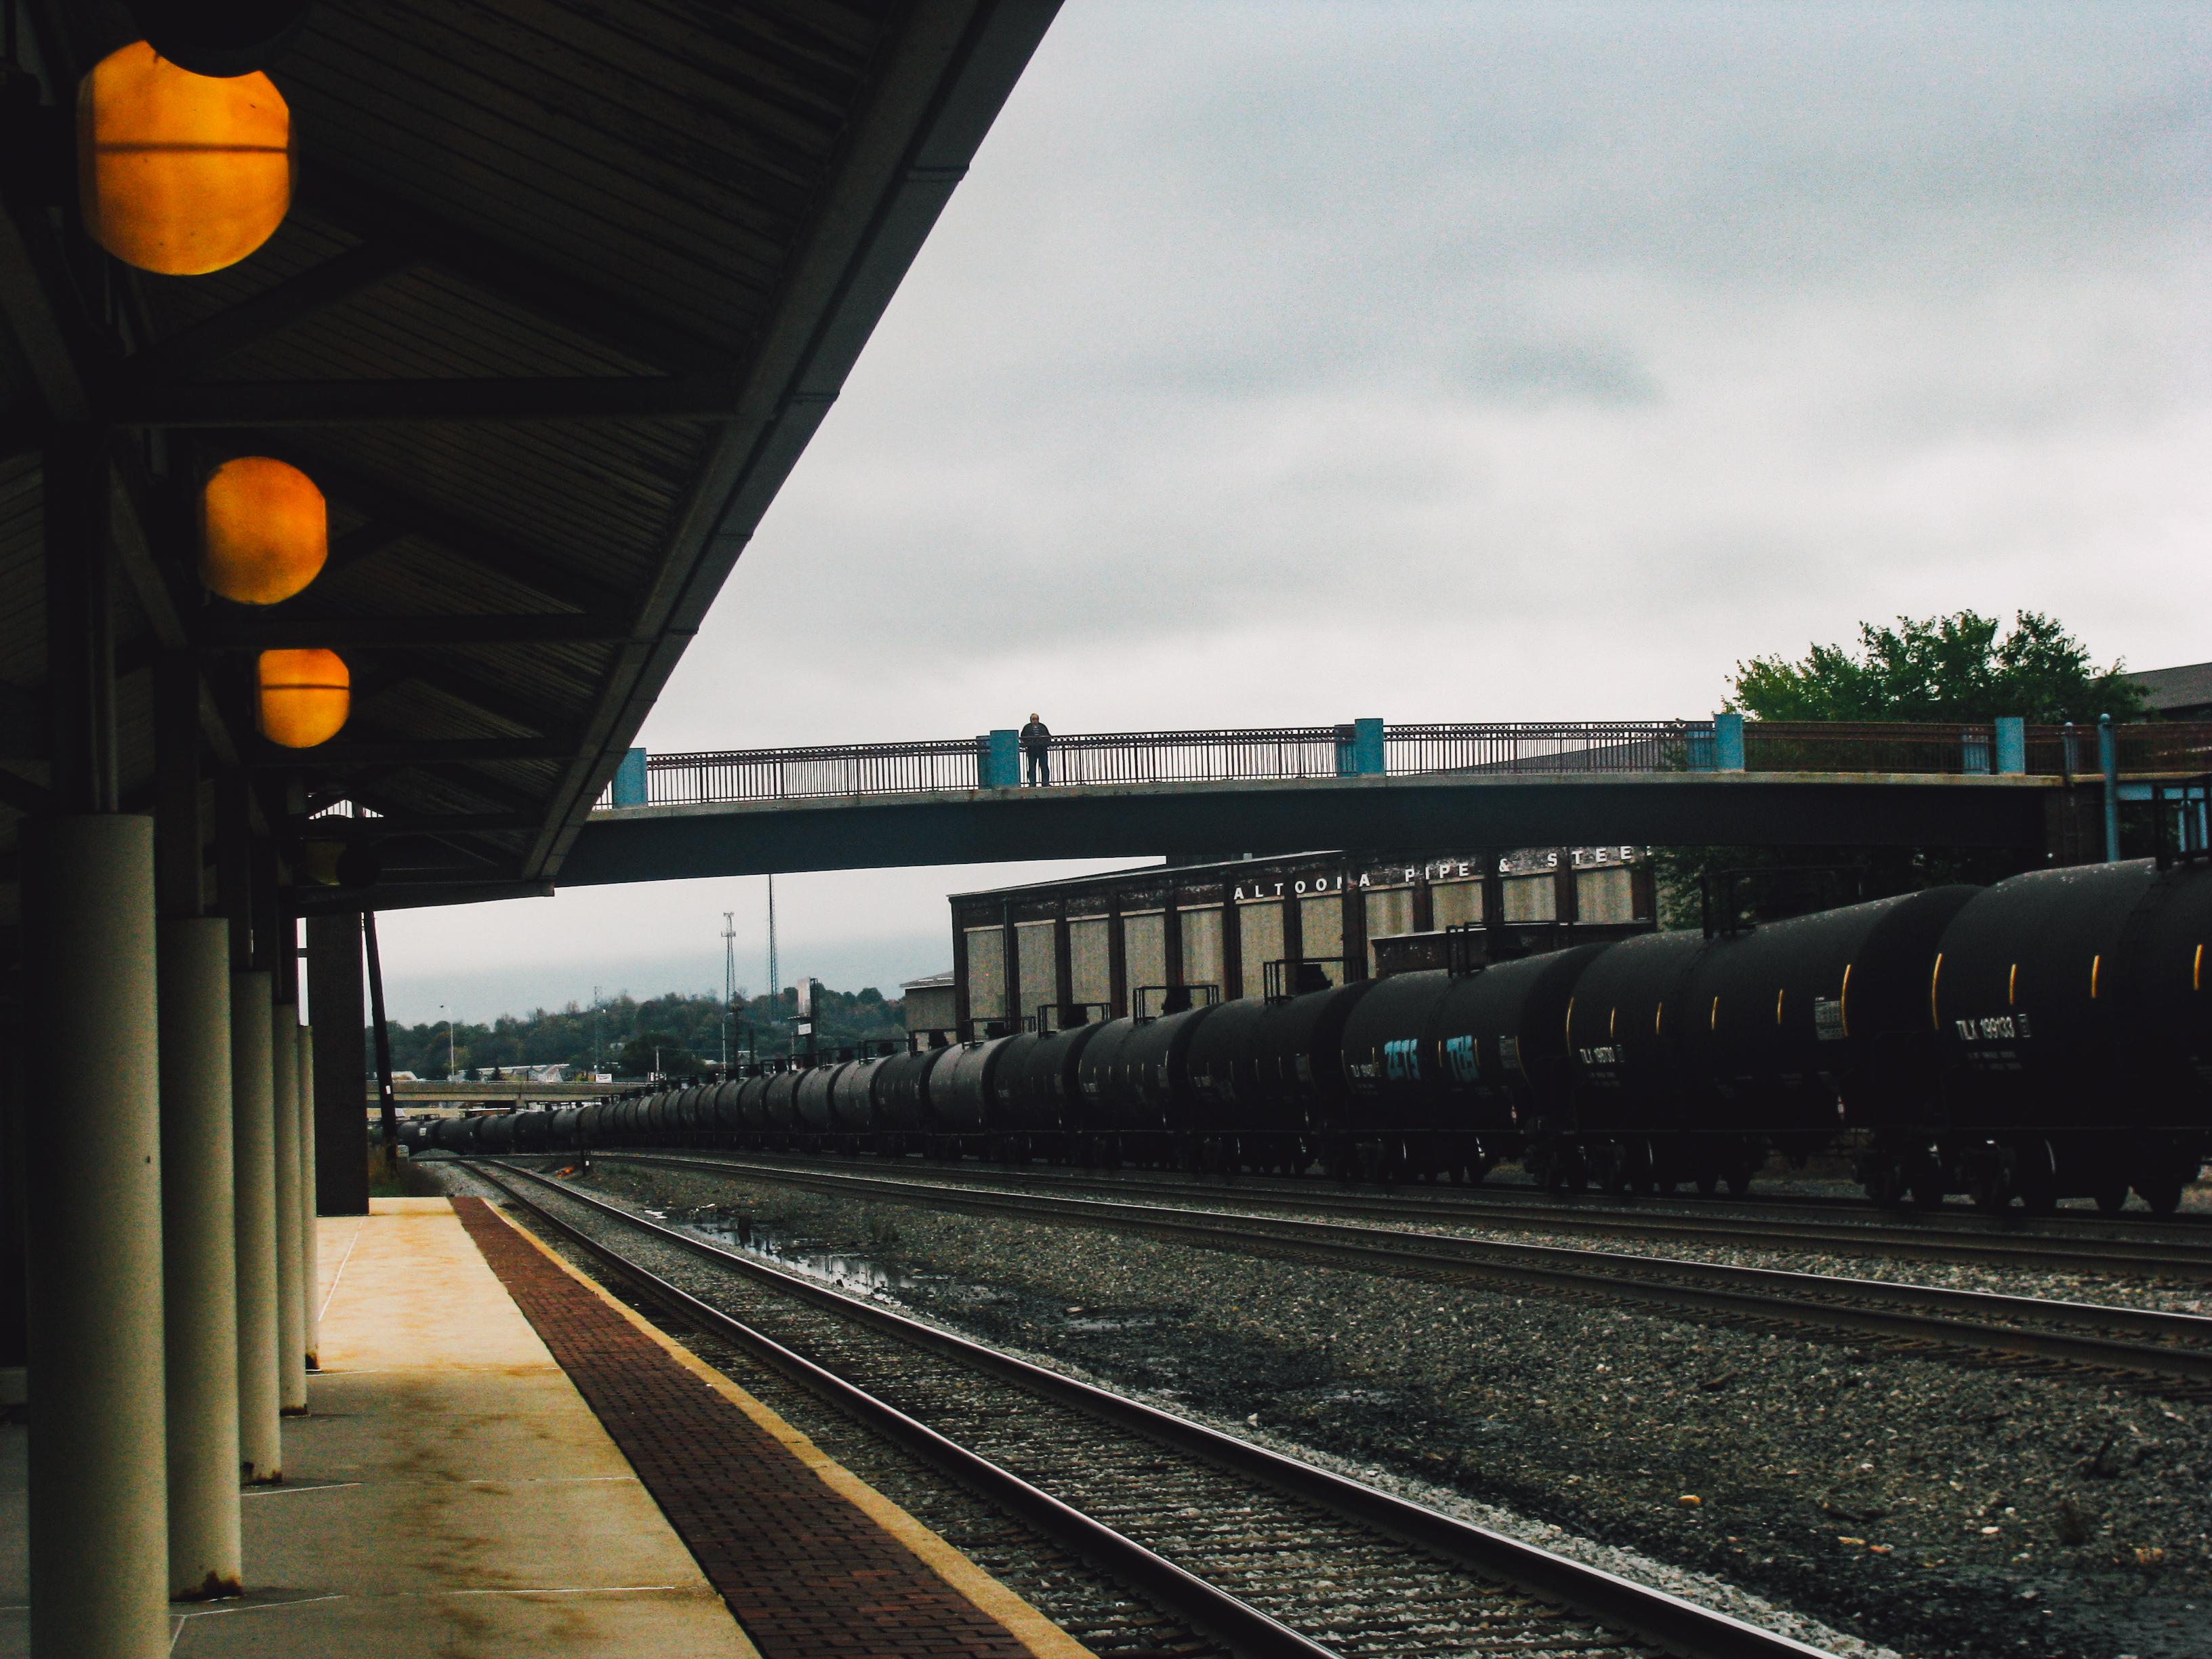 Train Station, Train, Station, Rail, Building, HQ Photo